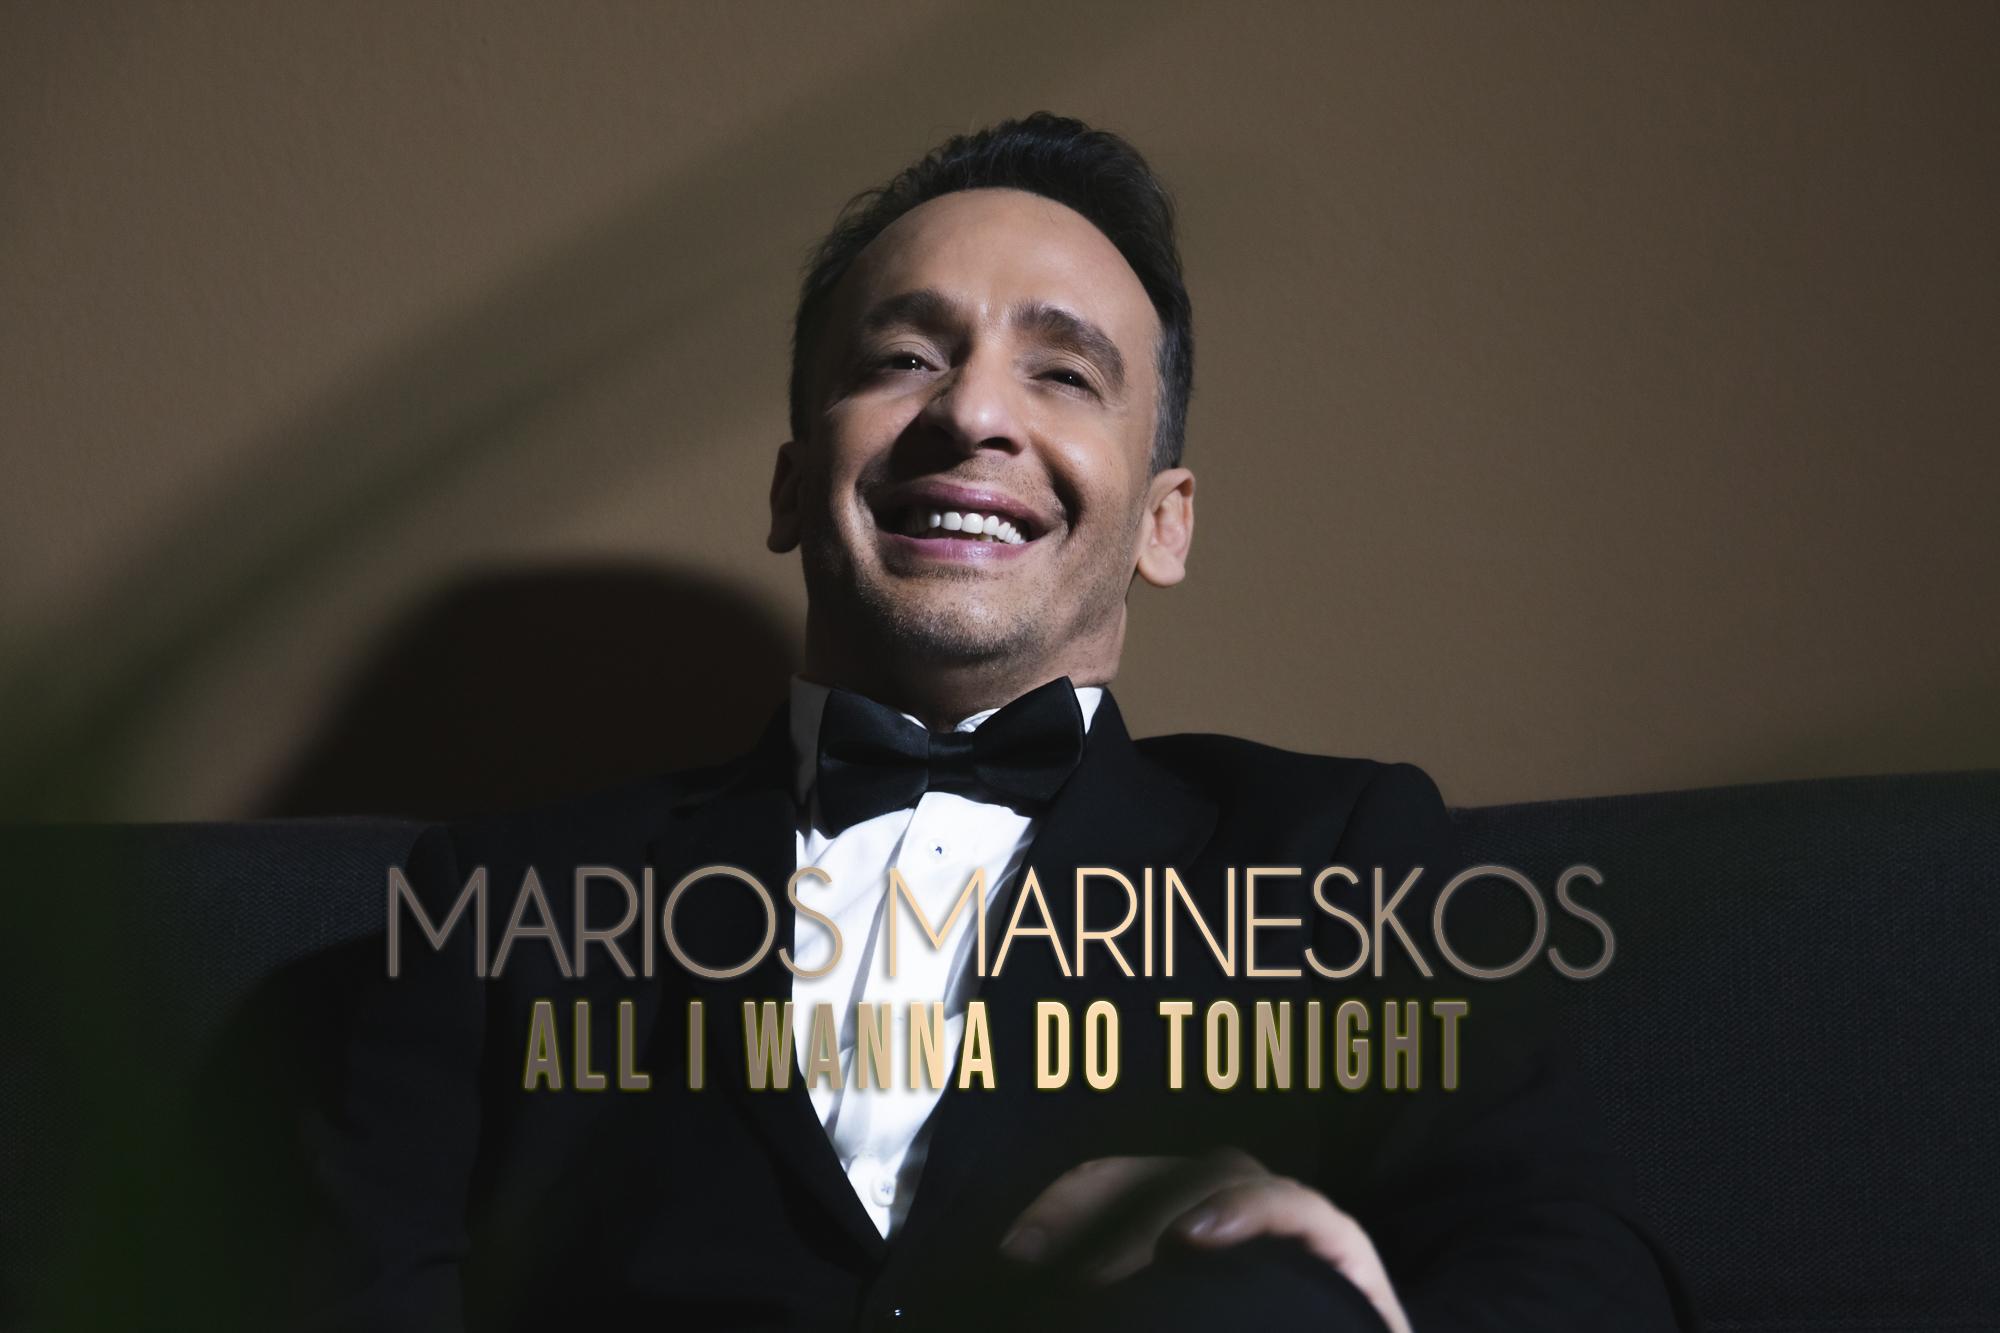 Presenting Marios Marineskos, a Romanian Greek Singer/Songwriter